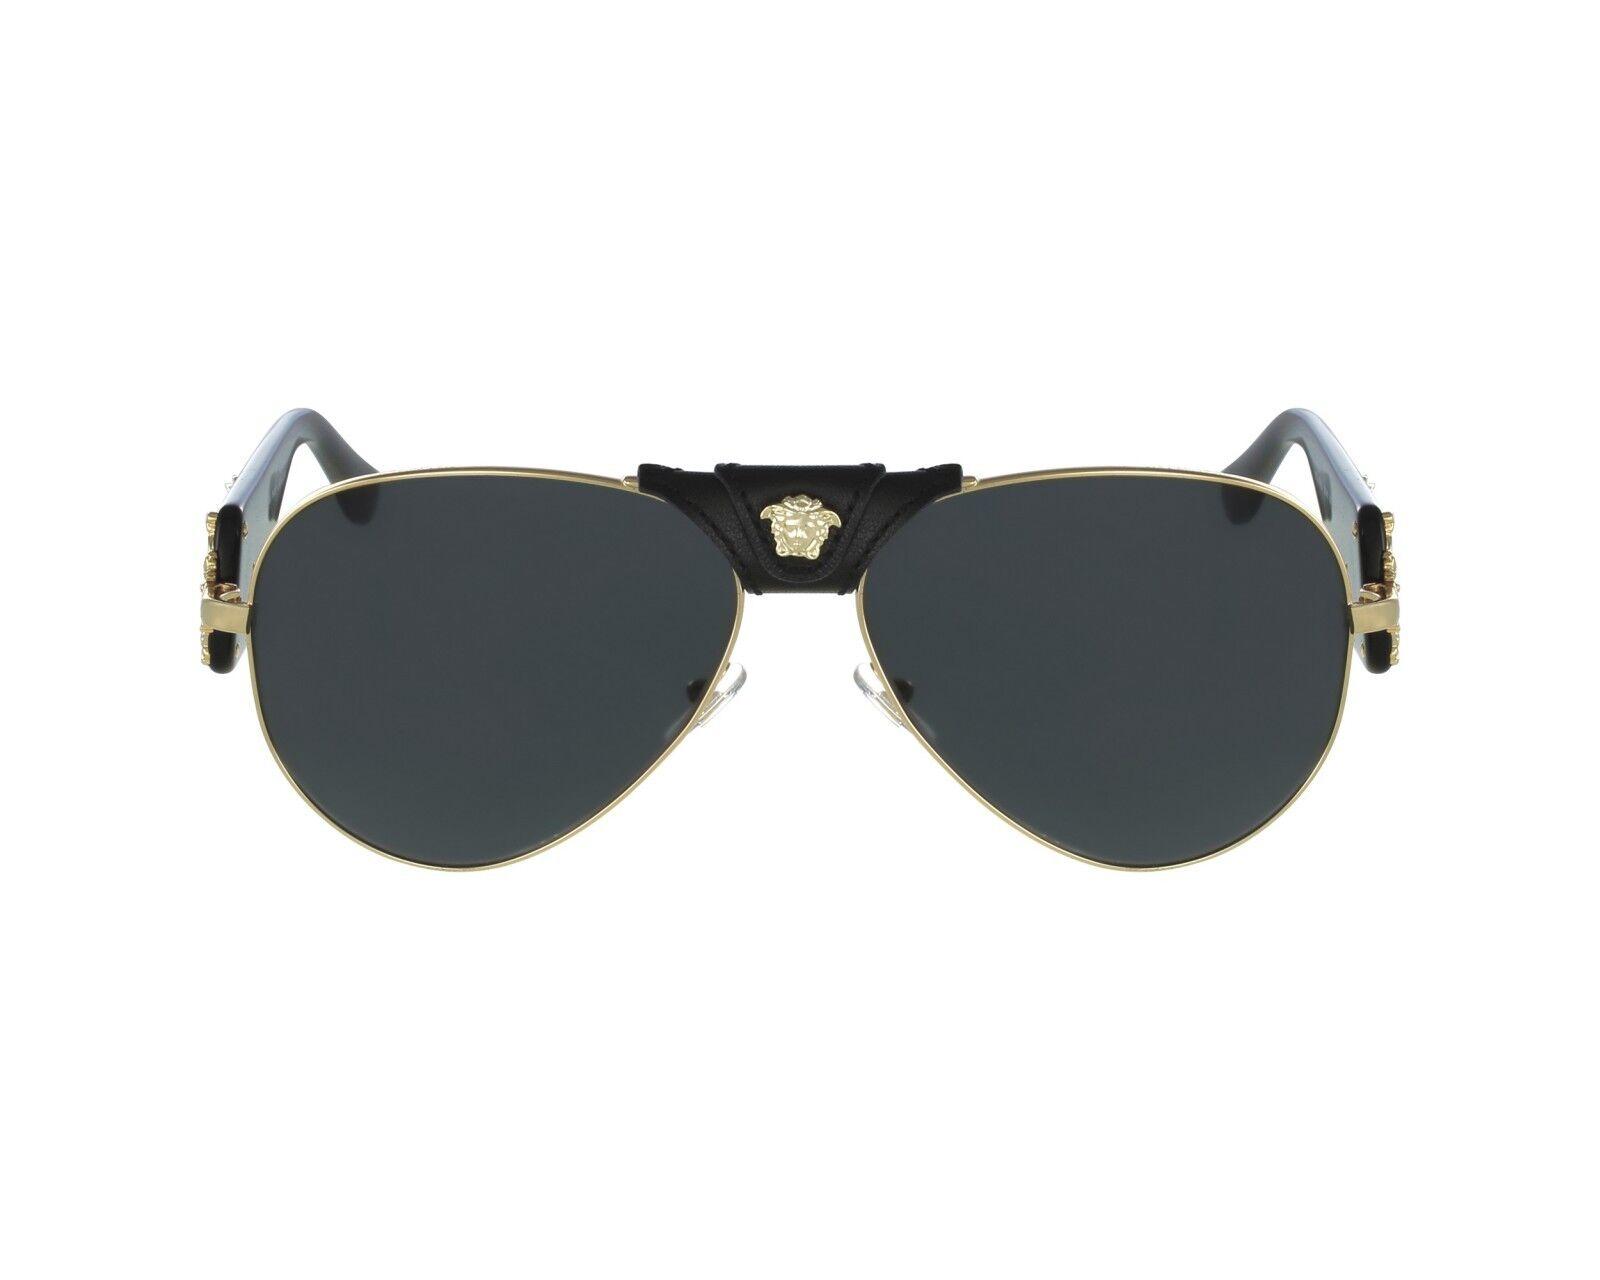 022b0d2d32d49 ... Dark Gray 62 mm 100287 NIB NWT Versace Sunglasses VE 2150Q 1002 87  Black Gold   Dark Gray 62 mm 100287 NIB NWT Versace Sunglasses VE 2150Q  1002 87 Black ...